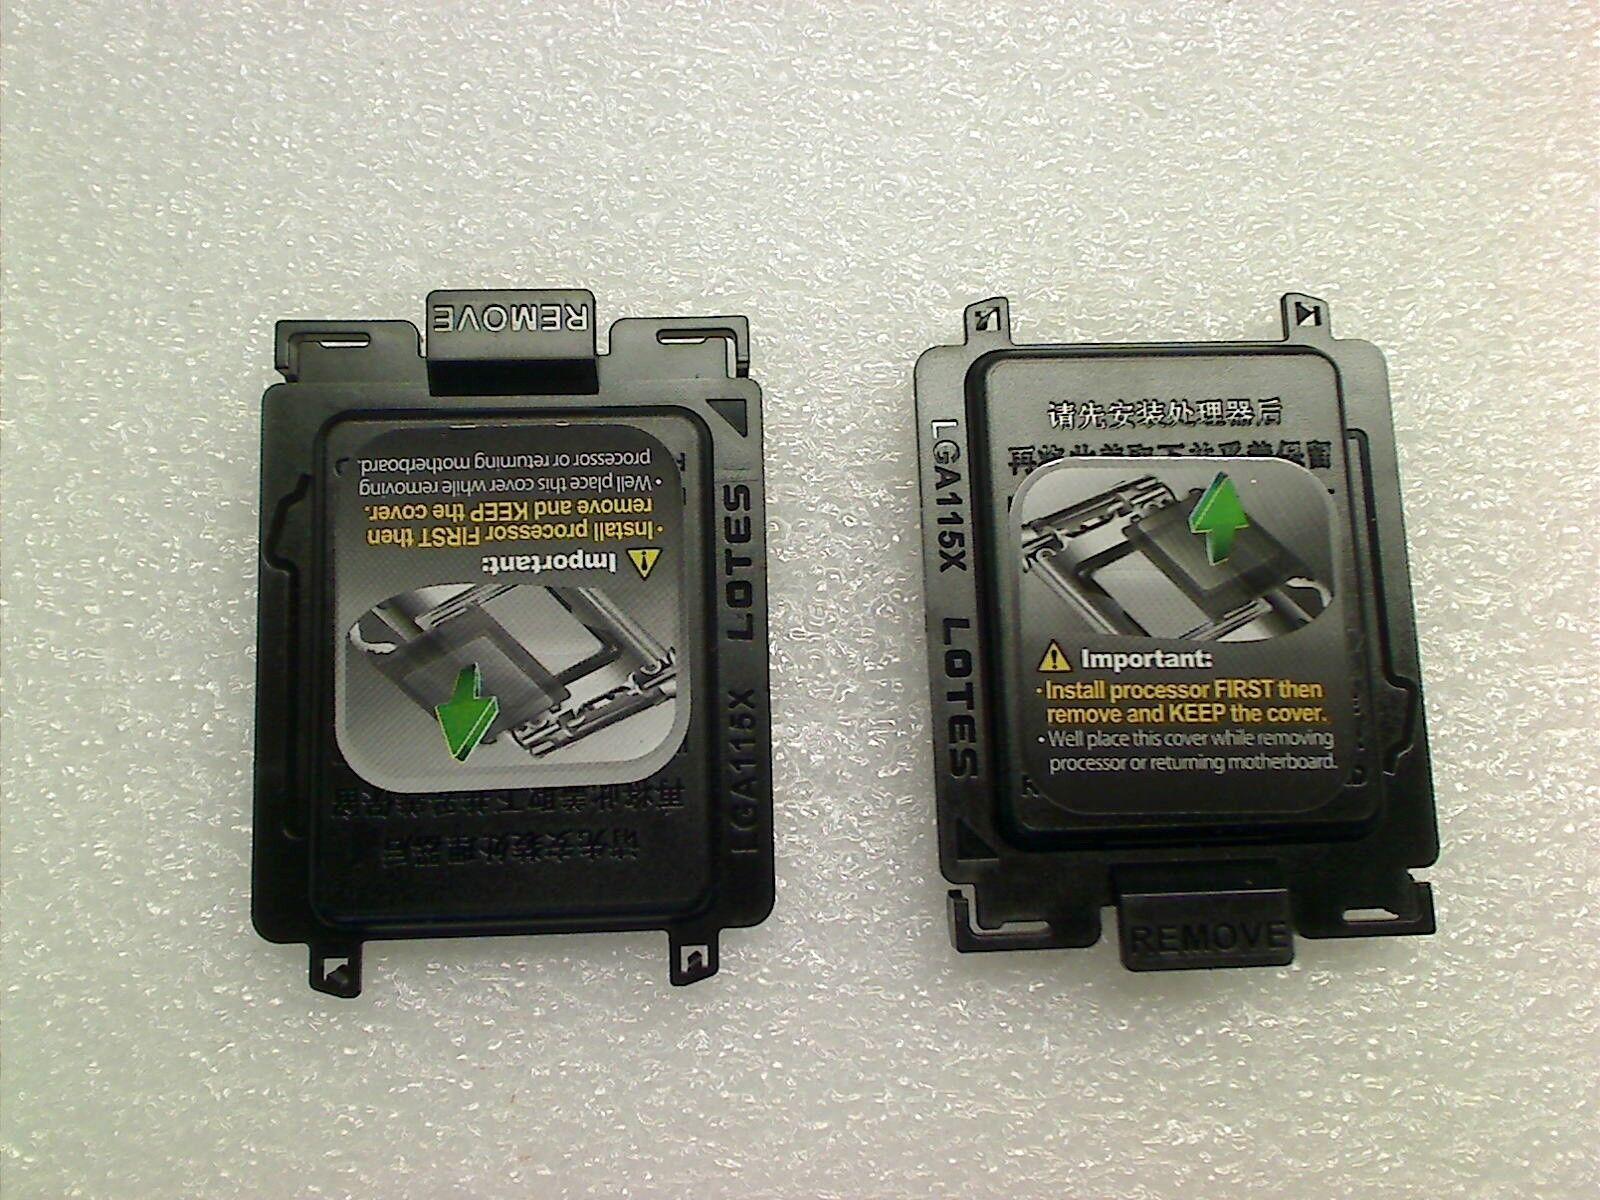 Intel LGA1150 LGA1155 1156 CPU Processor Socket Protector Cover FOXCONN LGA115X